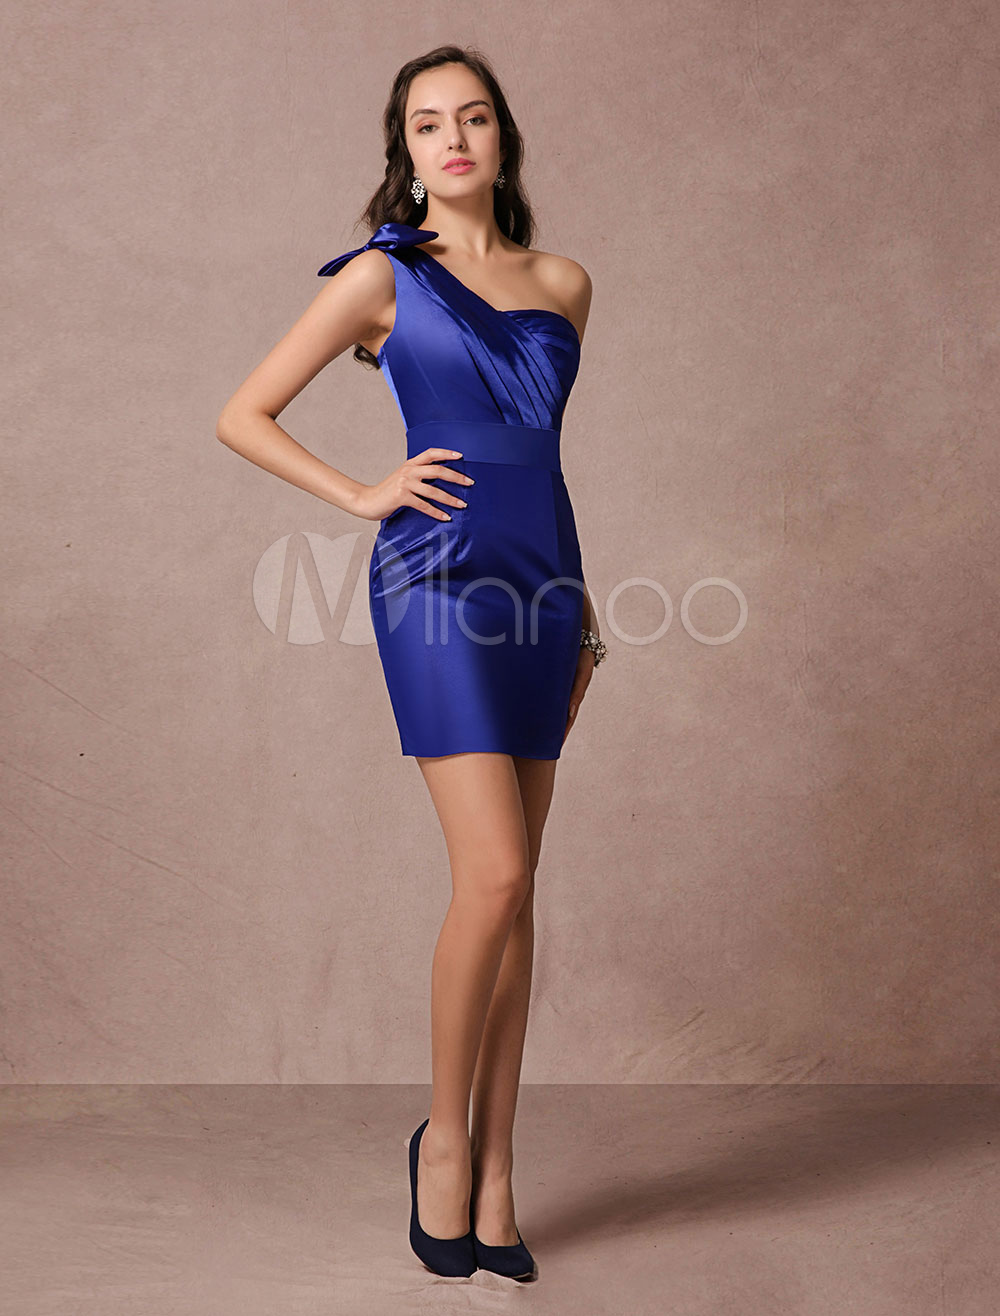 Blue Satin Cocktail Dress Sheath One-shoulder Backless Short Party Dress (Wedding Cocktail Dresses) photo